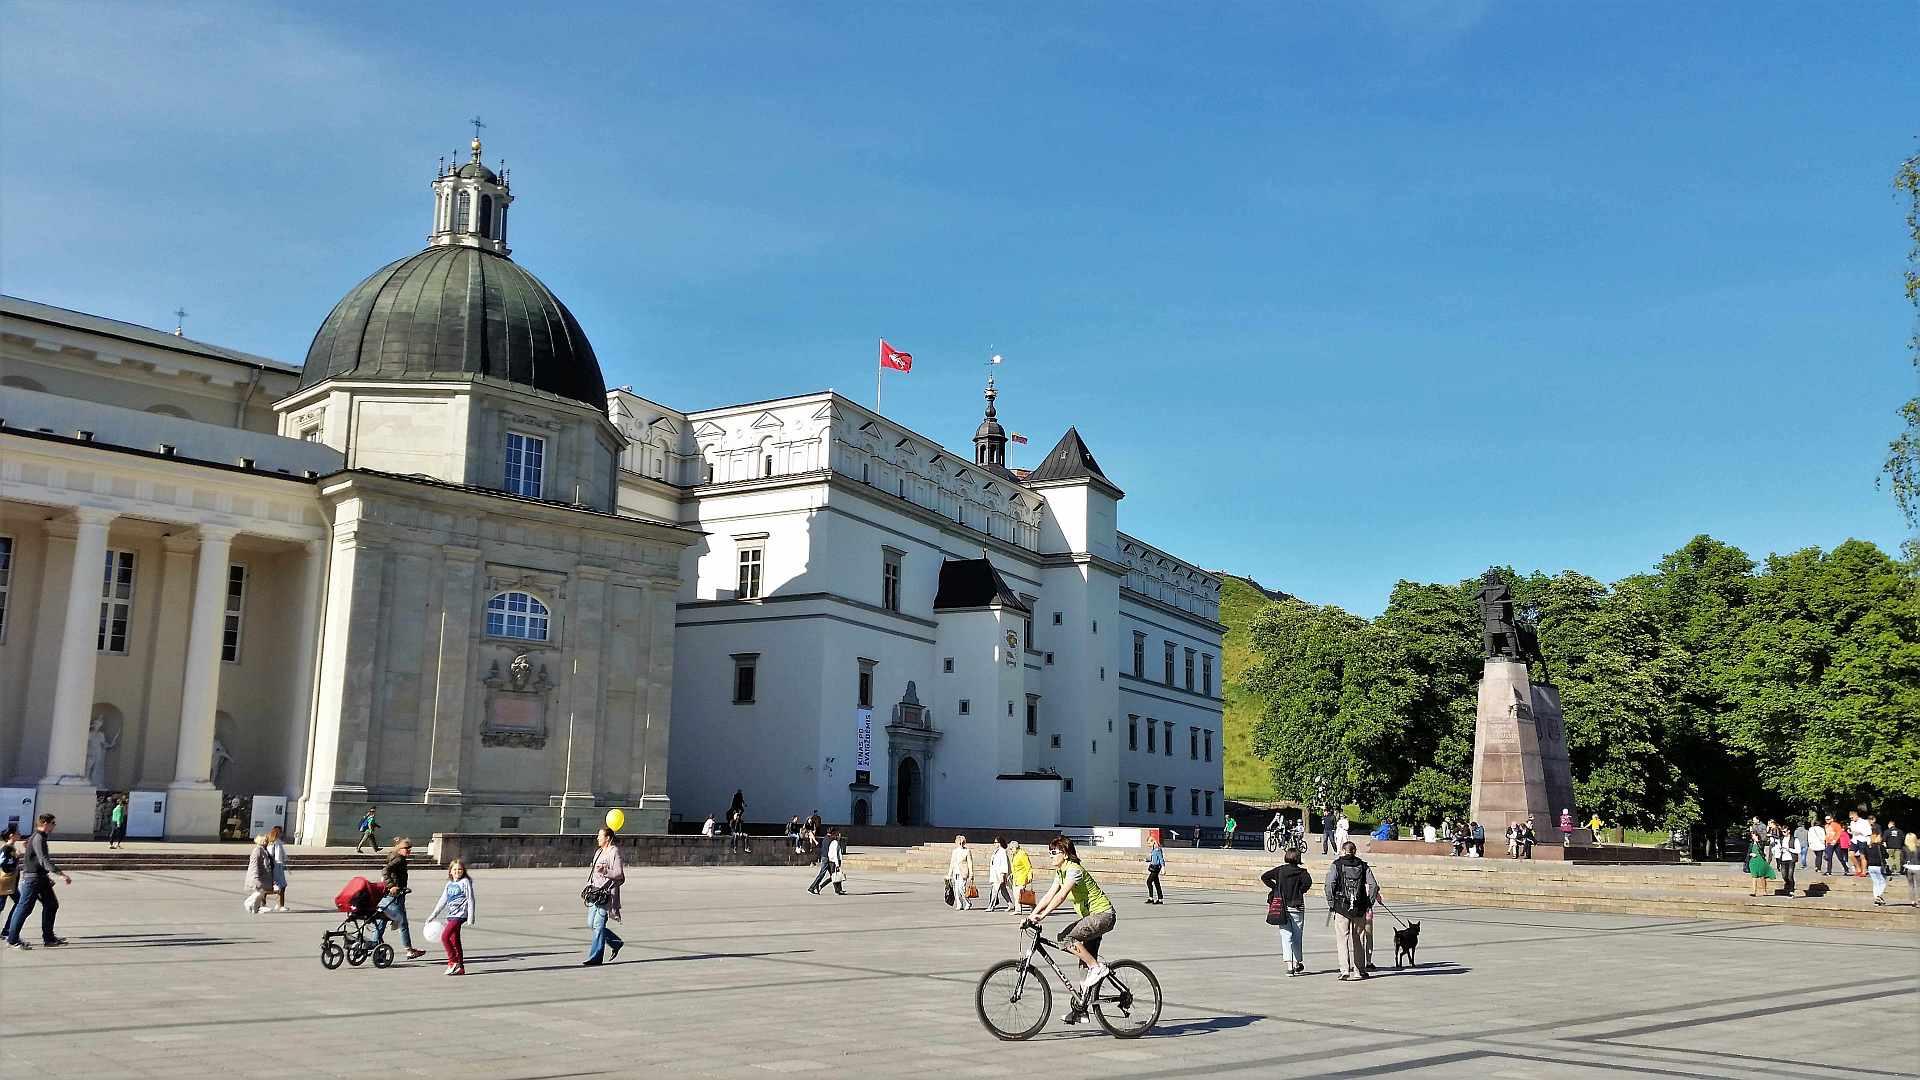 Cathedral square - Vilnius - trivo.ro